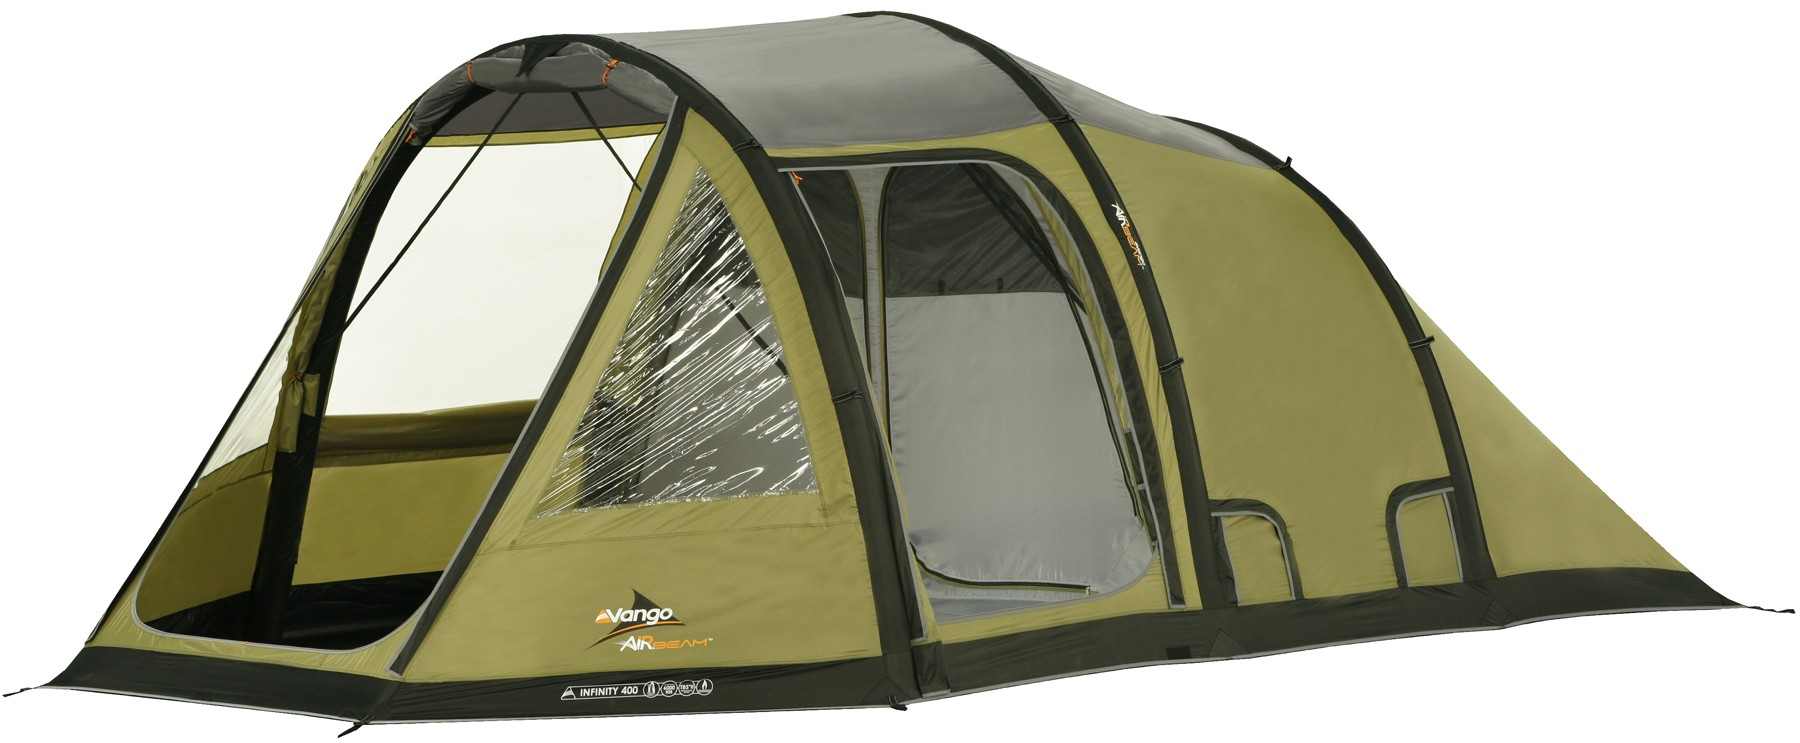 Vango Infinity 400 Airbeam Tunnel Tent Inflatable Tents